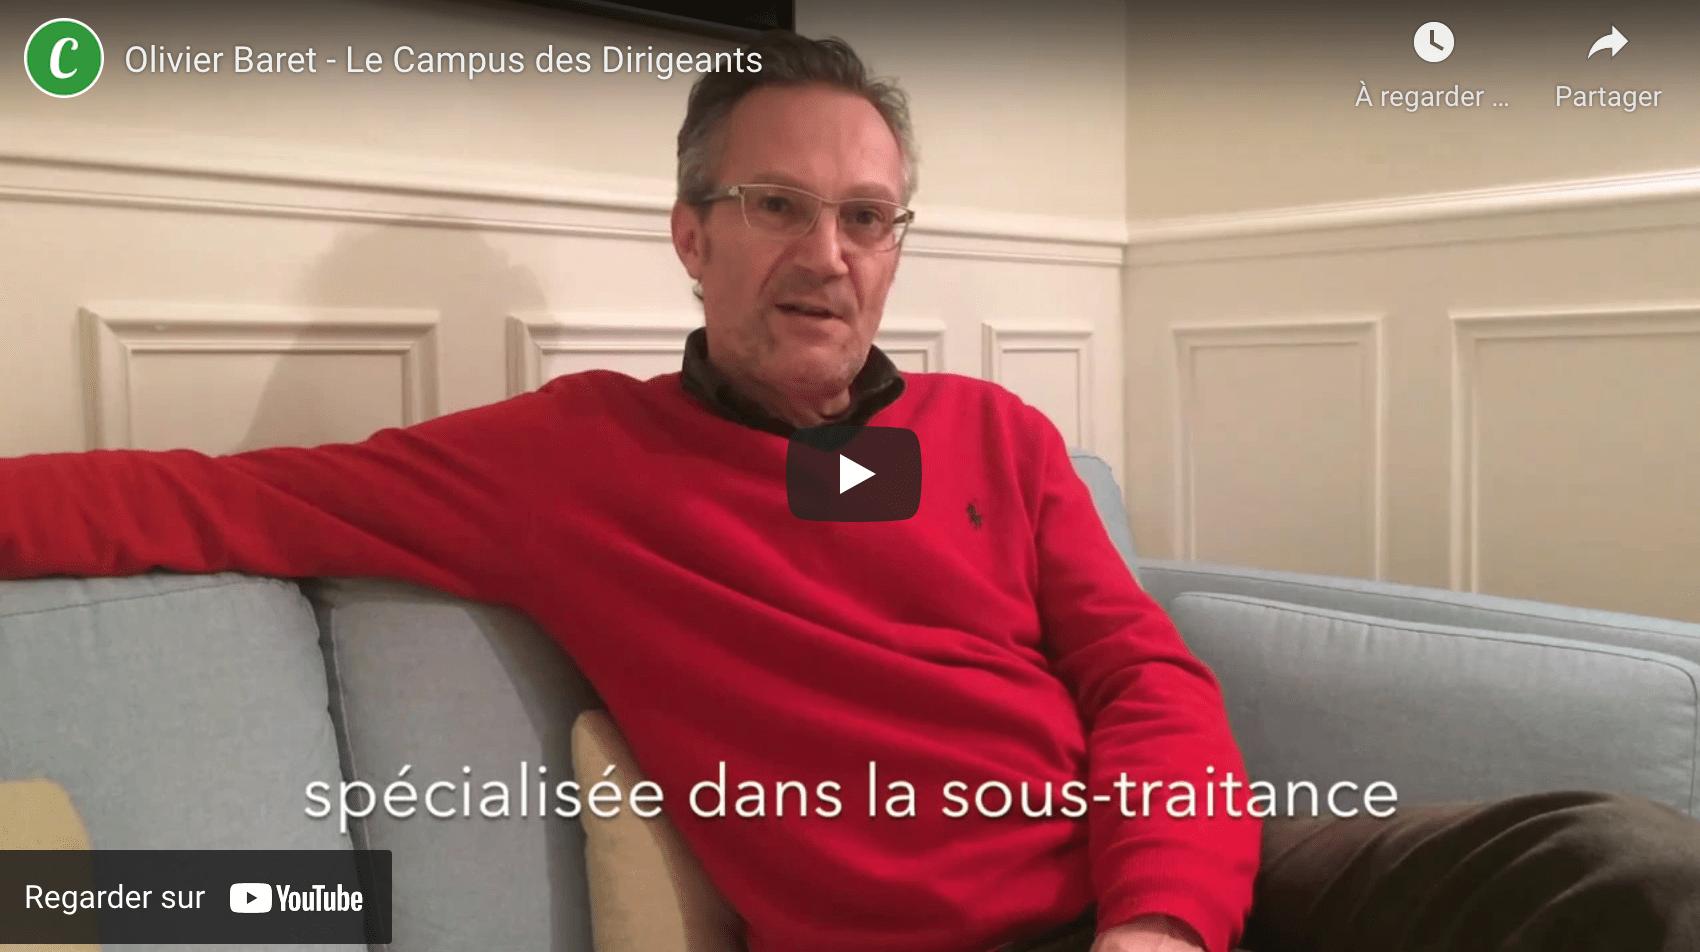 Olivier Baret du Campus des Dirigeants